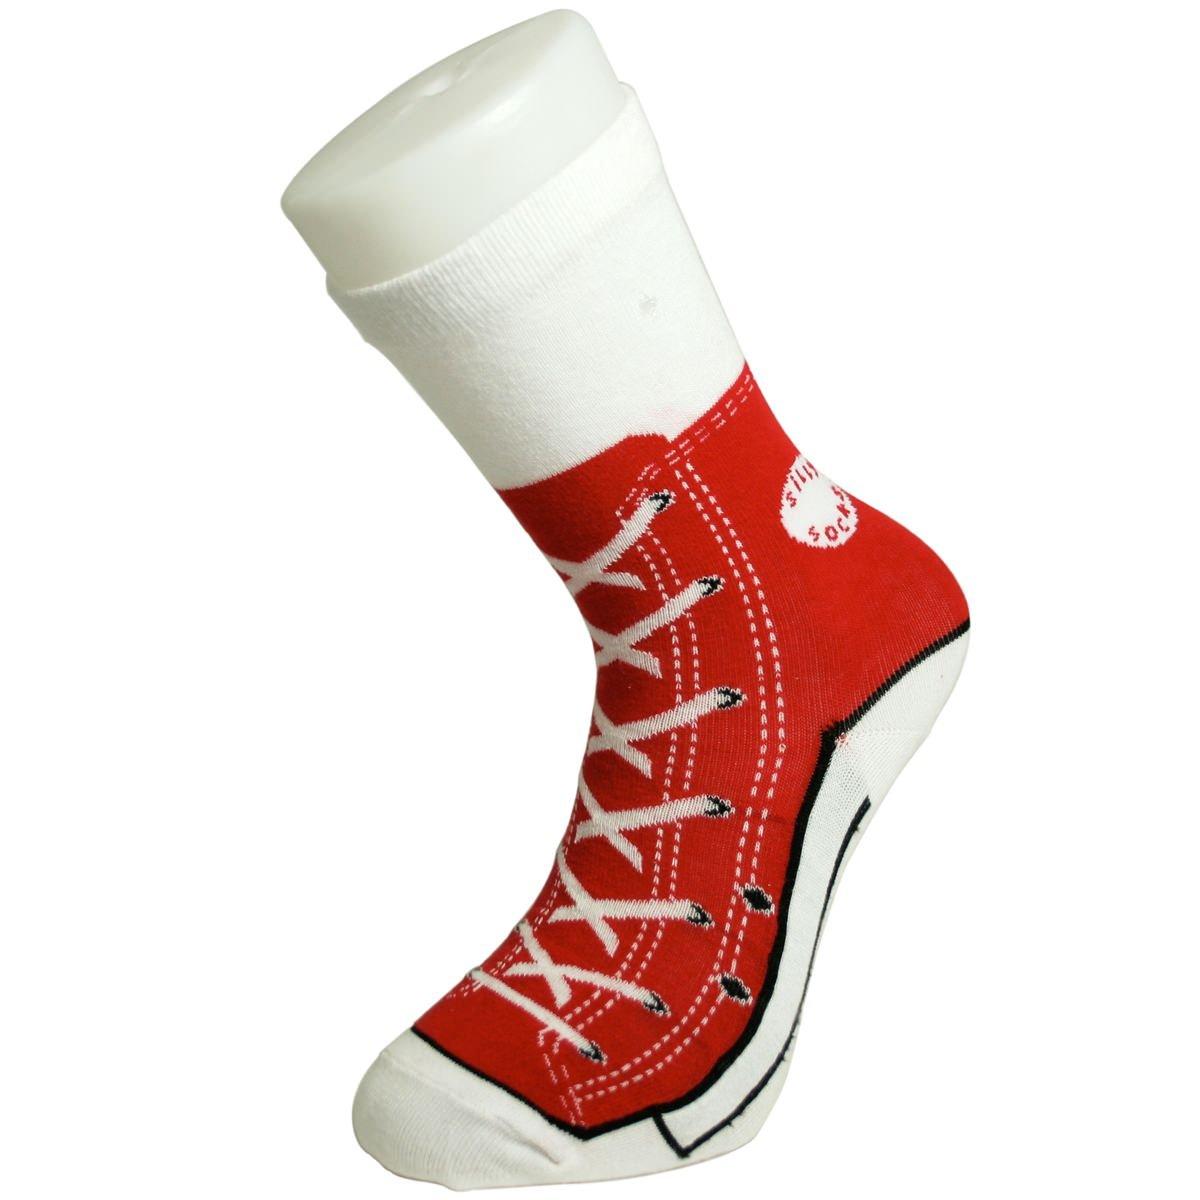 Blu Silly Socks - Calzini rossi, motivo sneaker, taglie dalla 38 alla 46 B05J1228.1